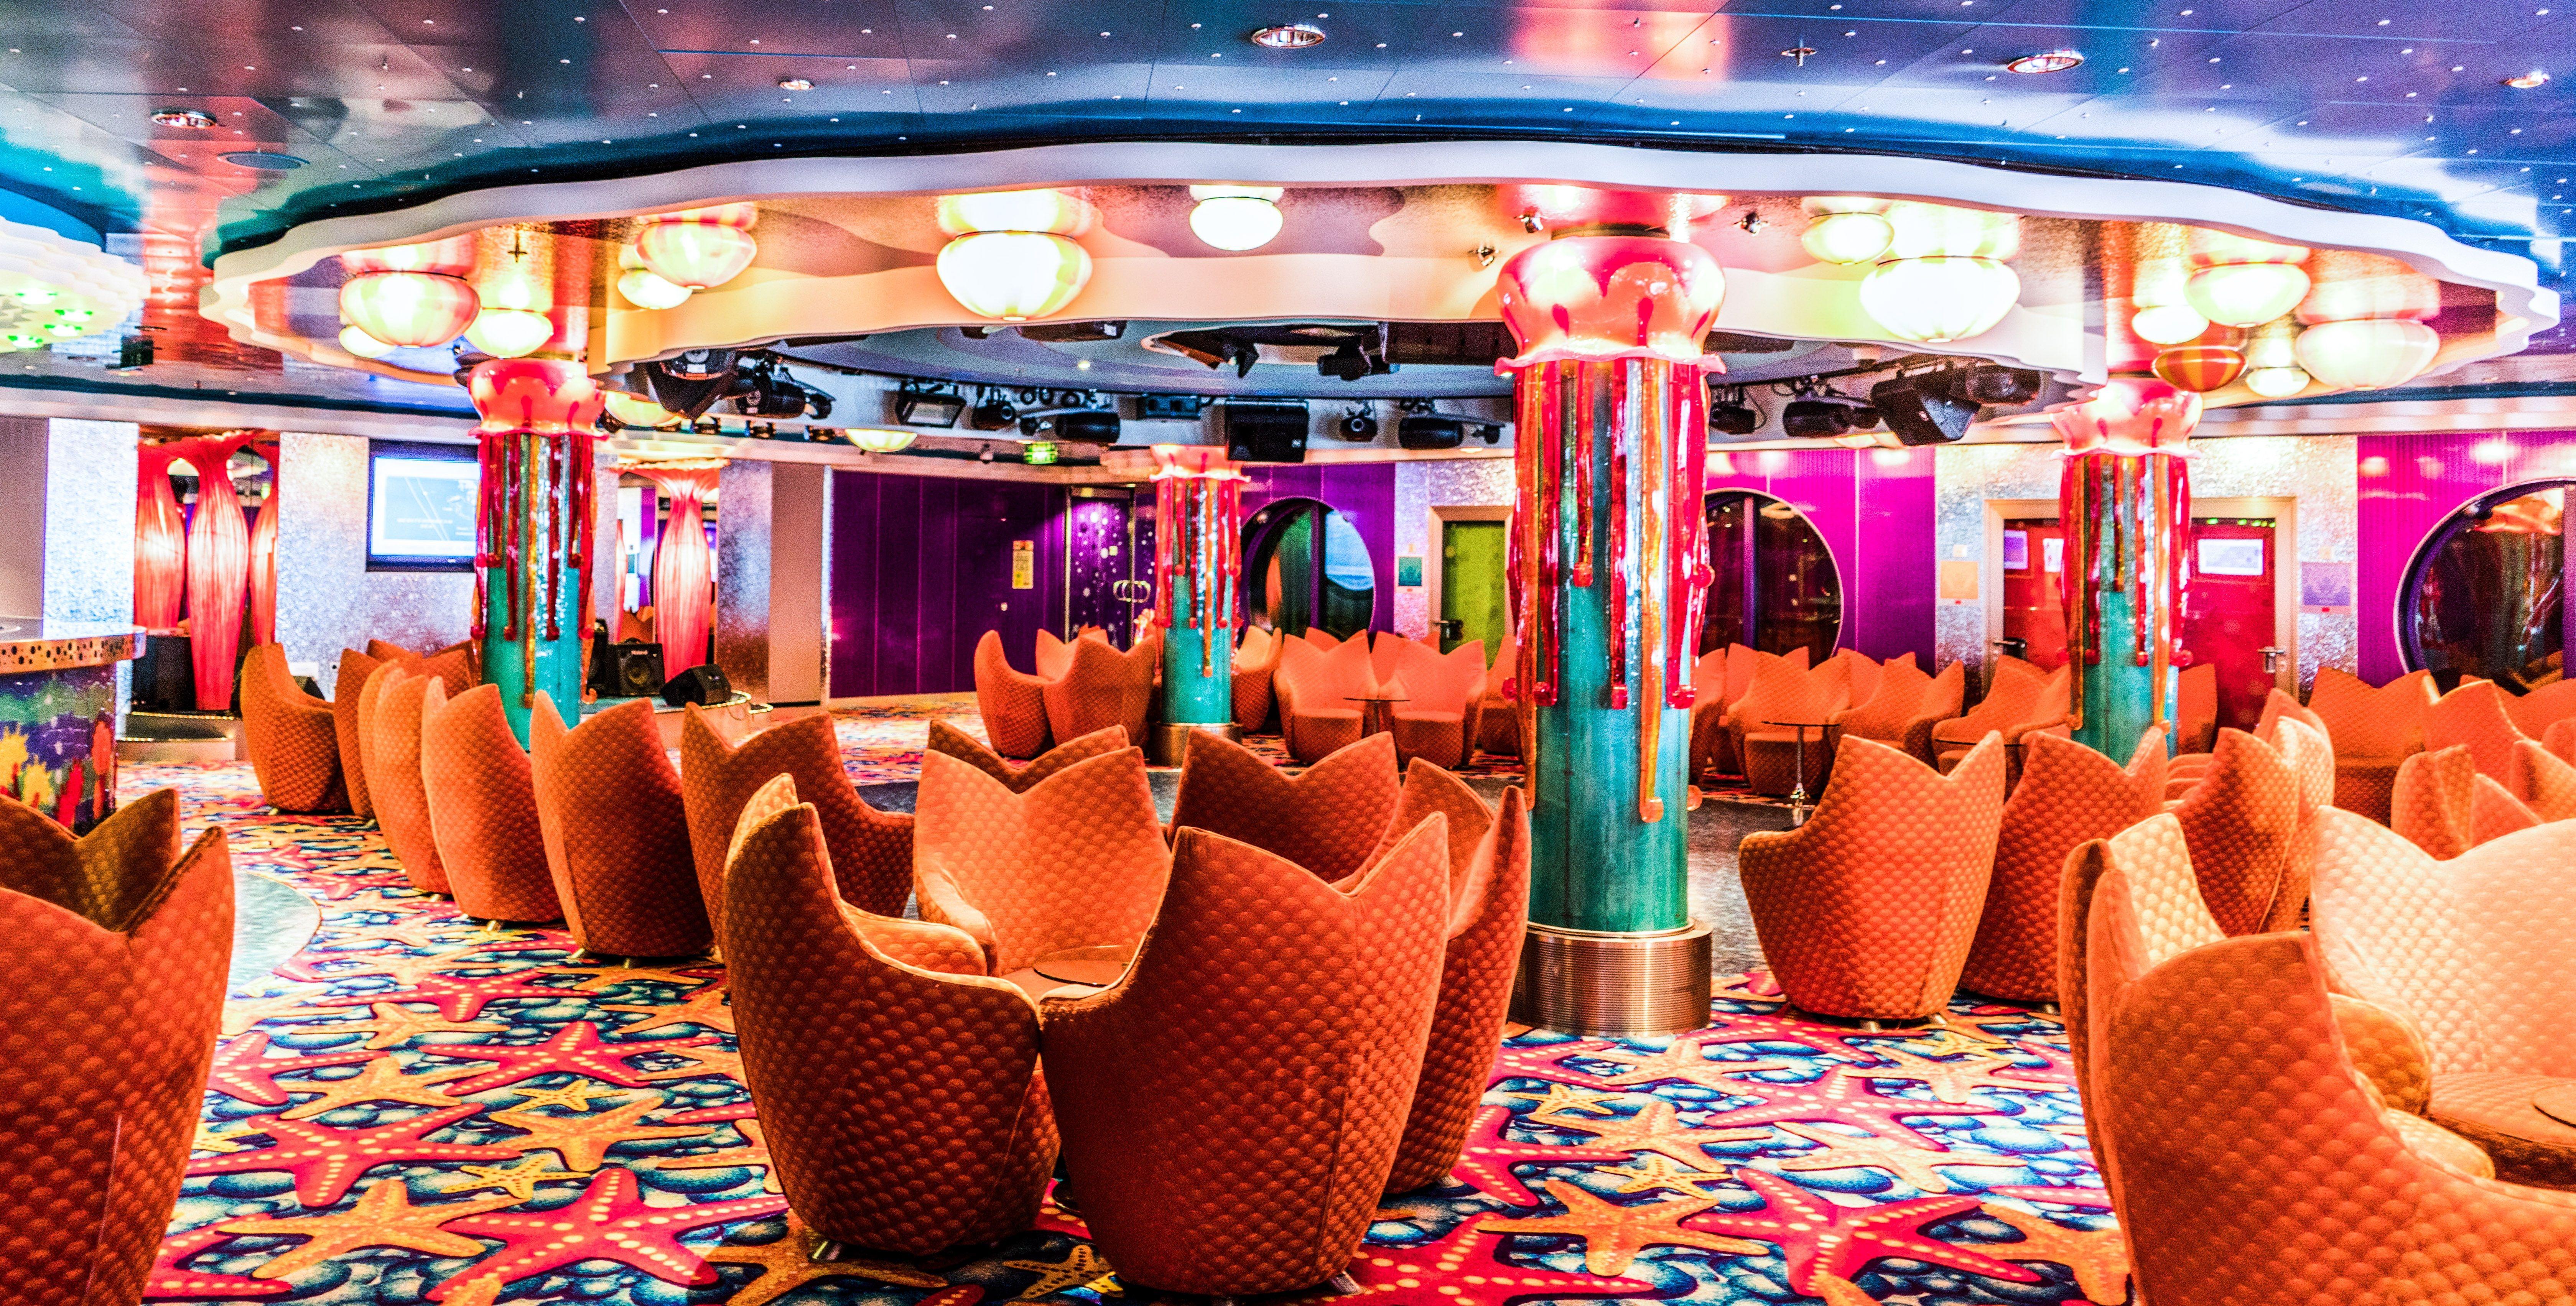 Inside the Norwegien Jade Cruise Ship.